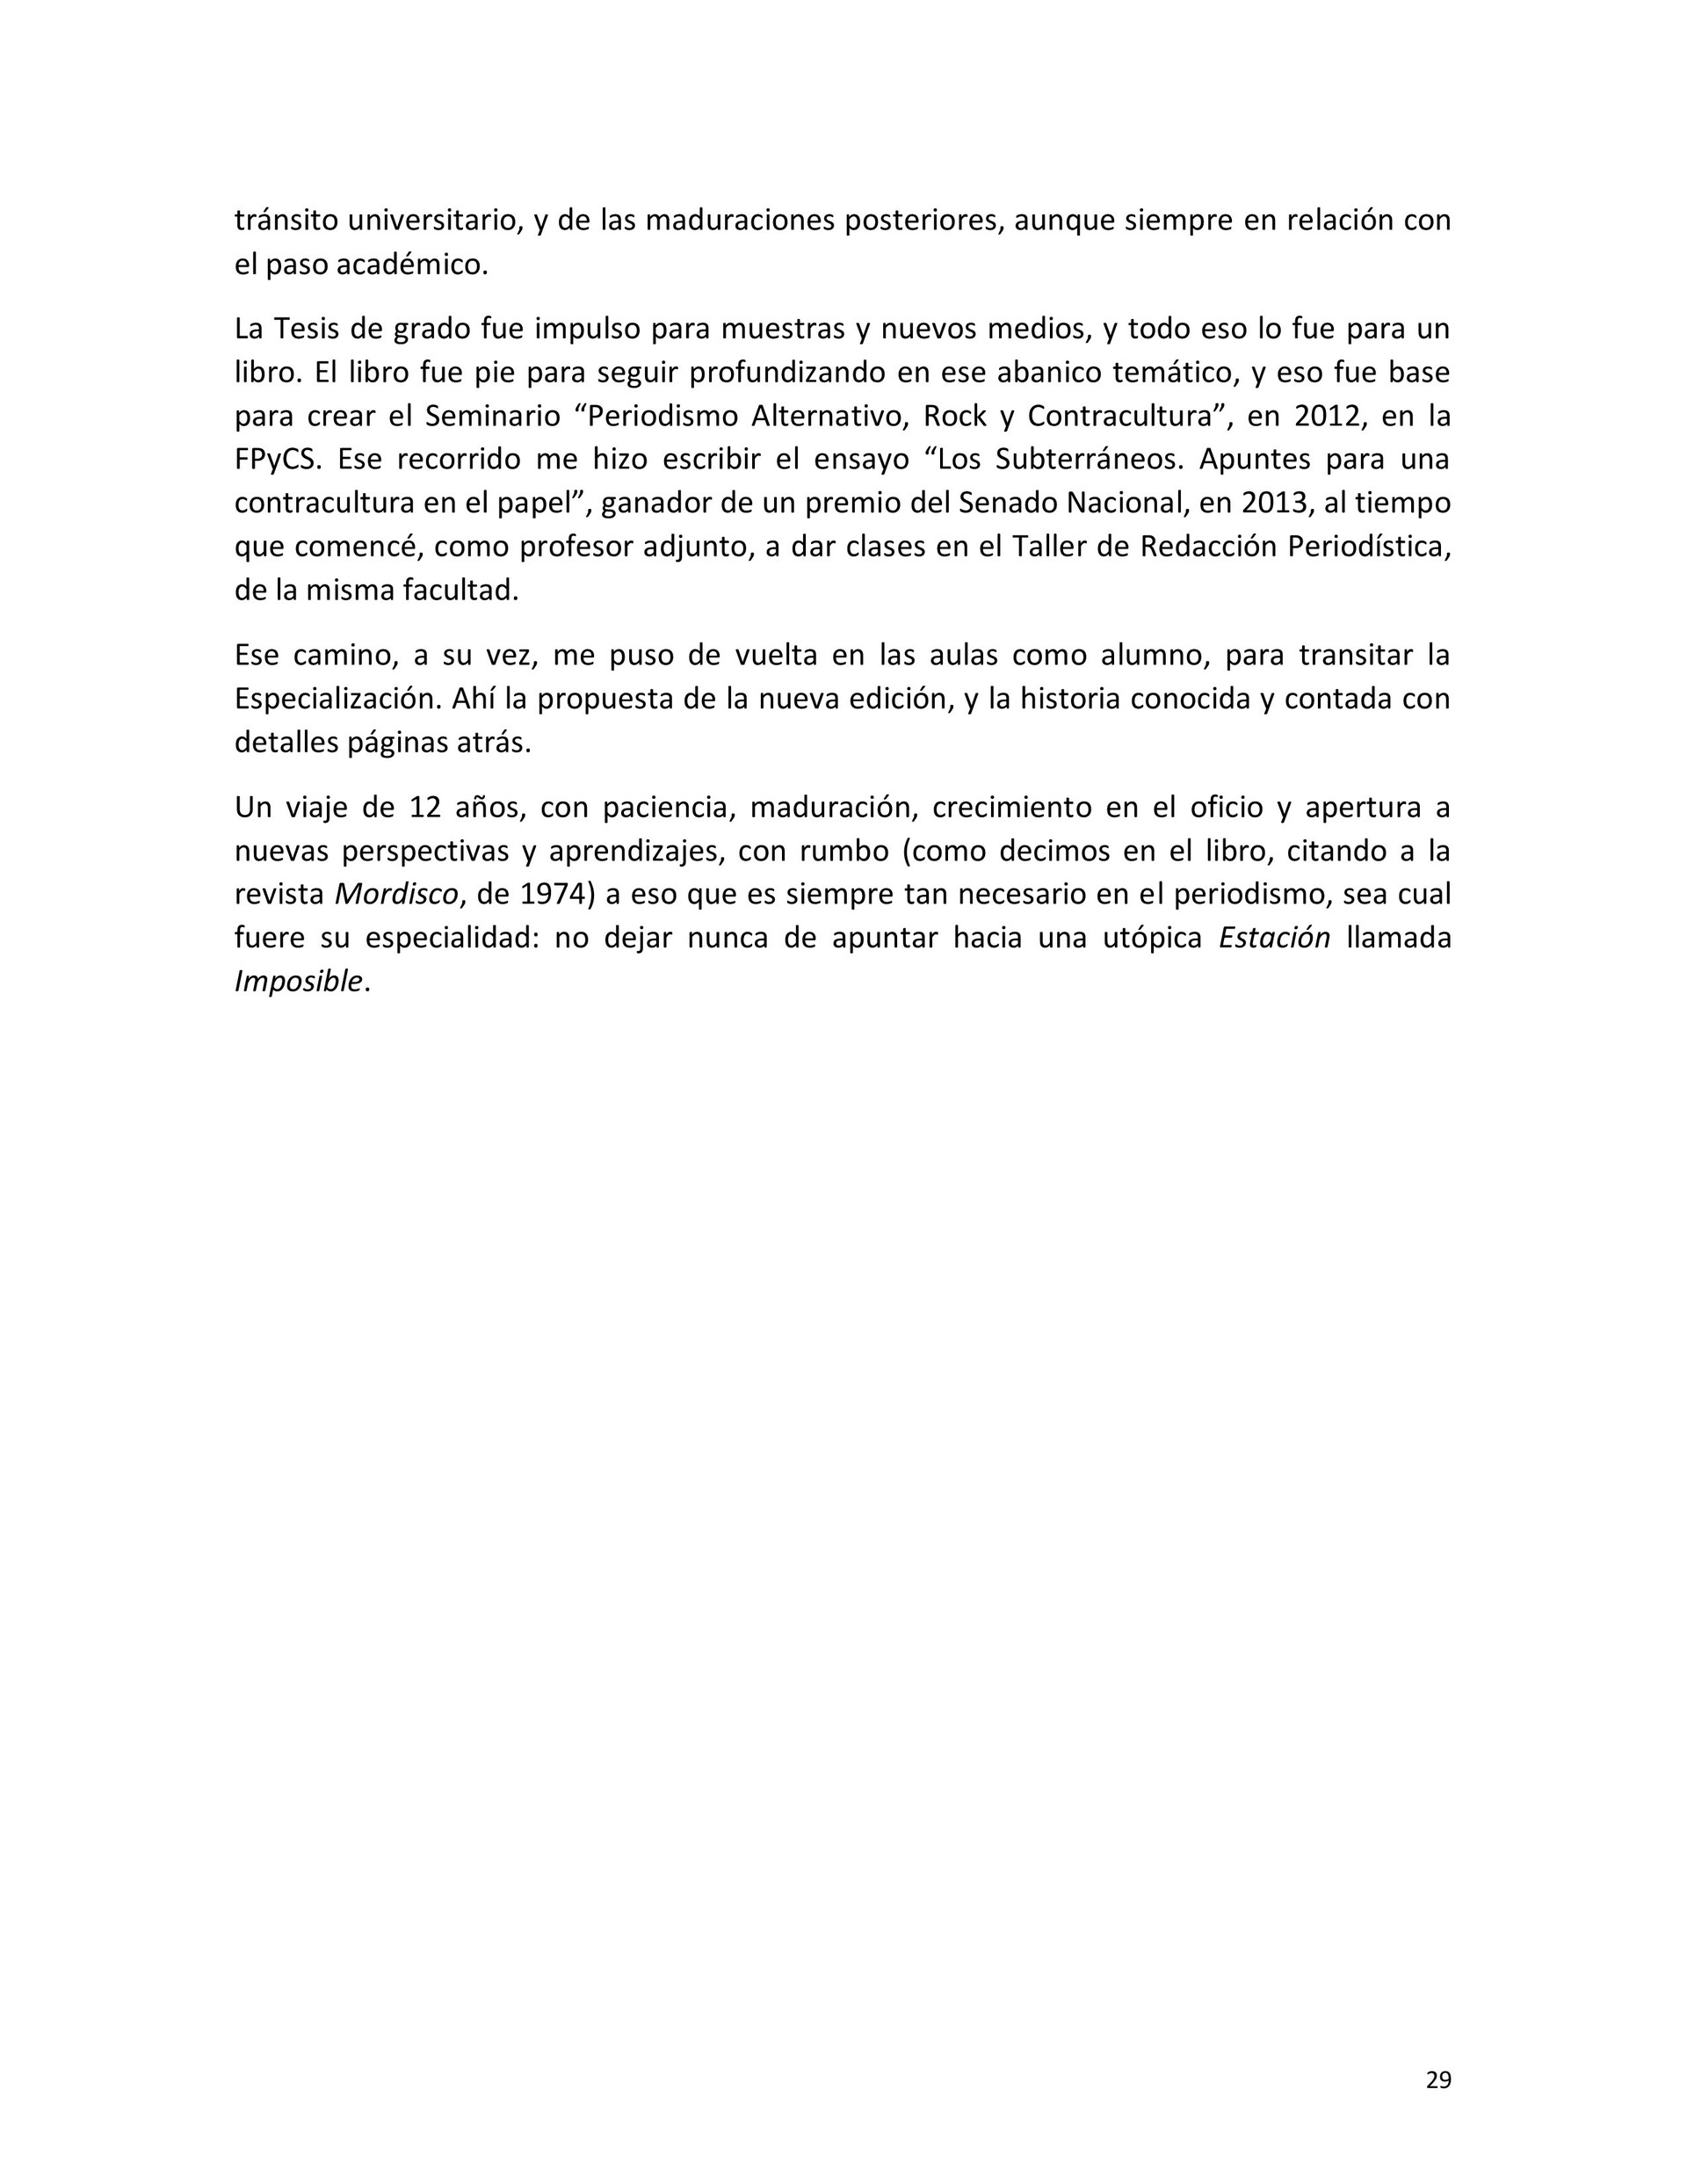 estacion_Page_28.jpeg